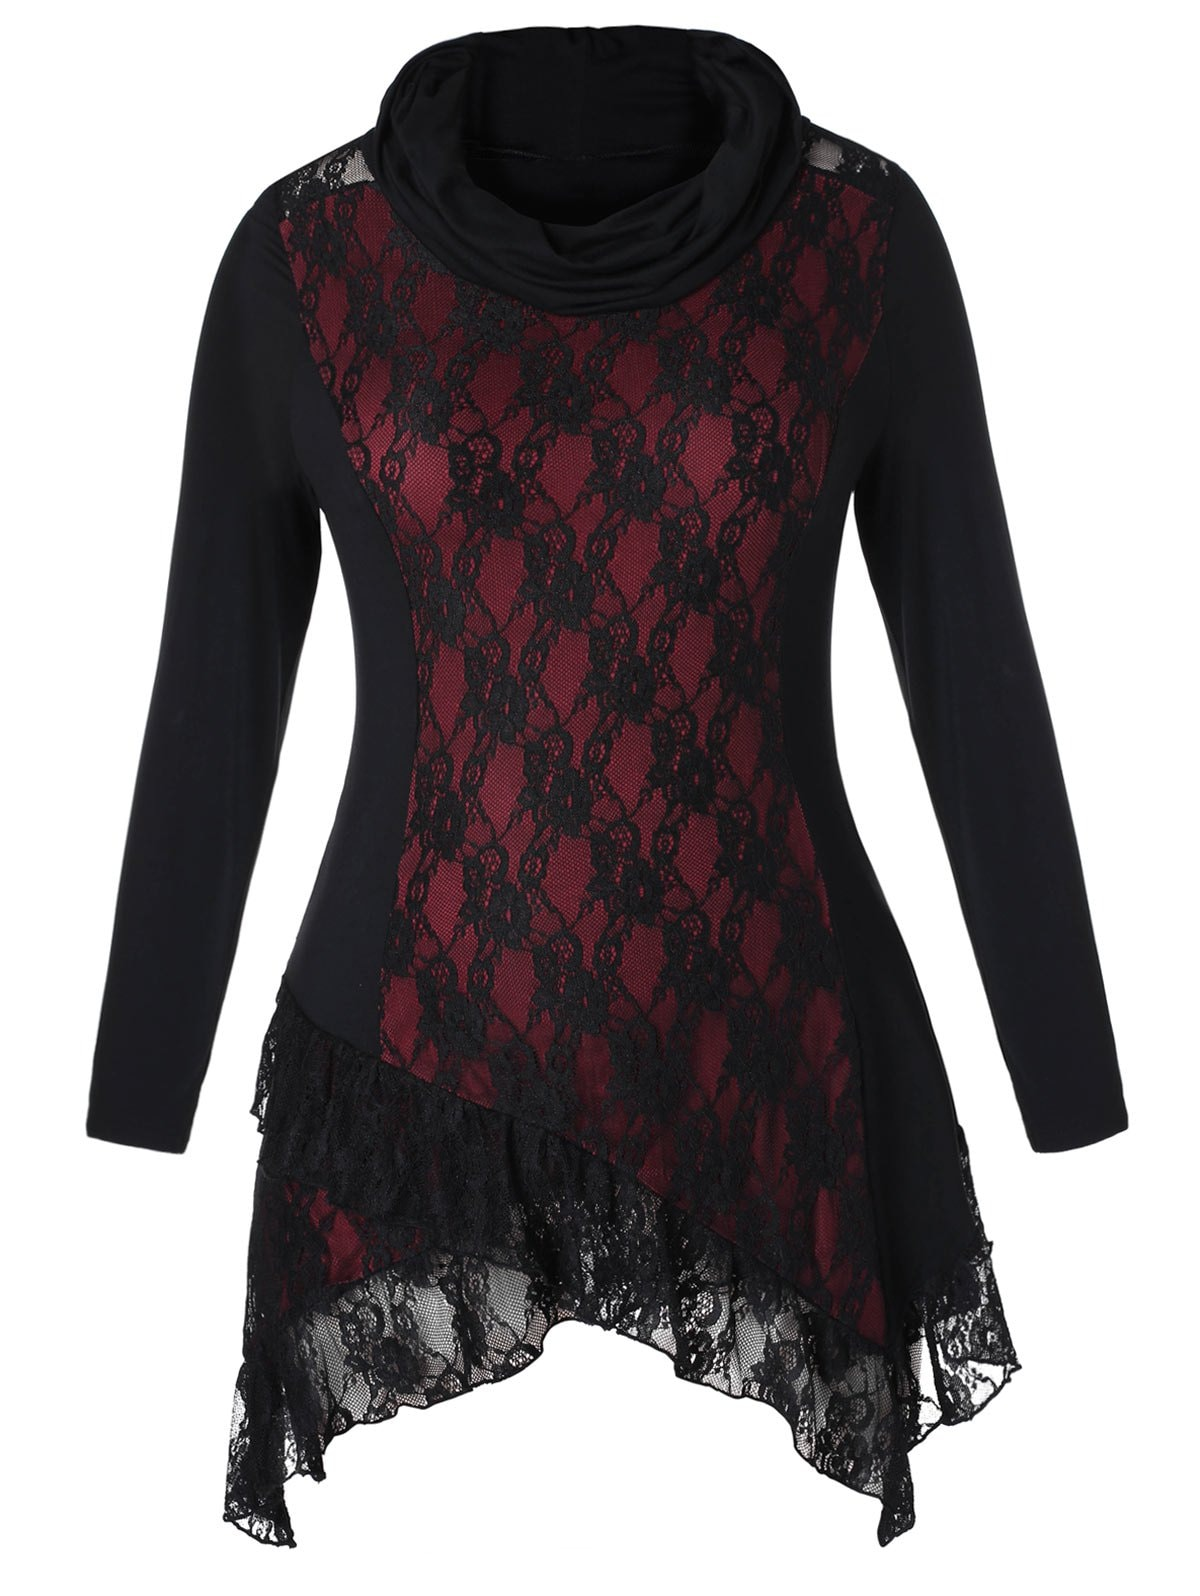 Plus Size Asymmetrical Cowl Neck Lace Insert T-shirt